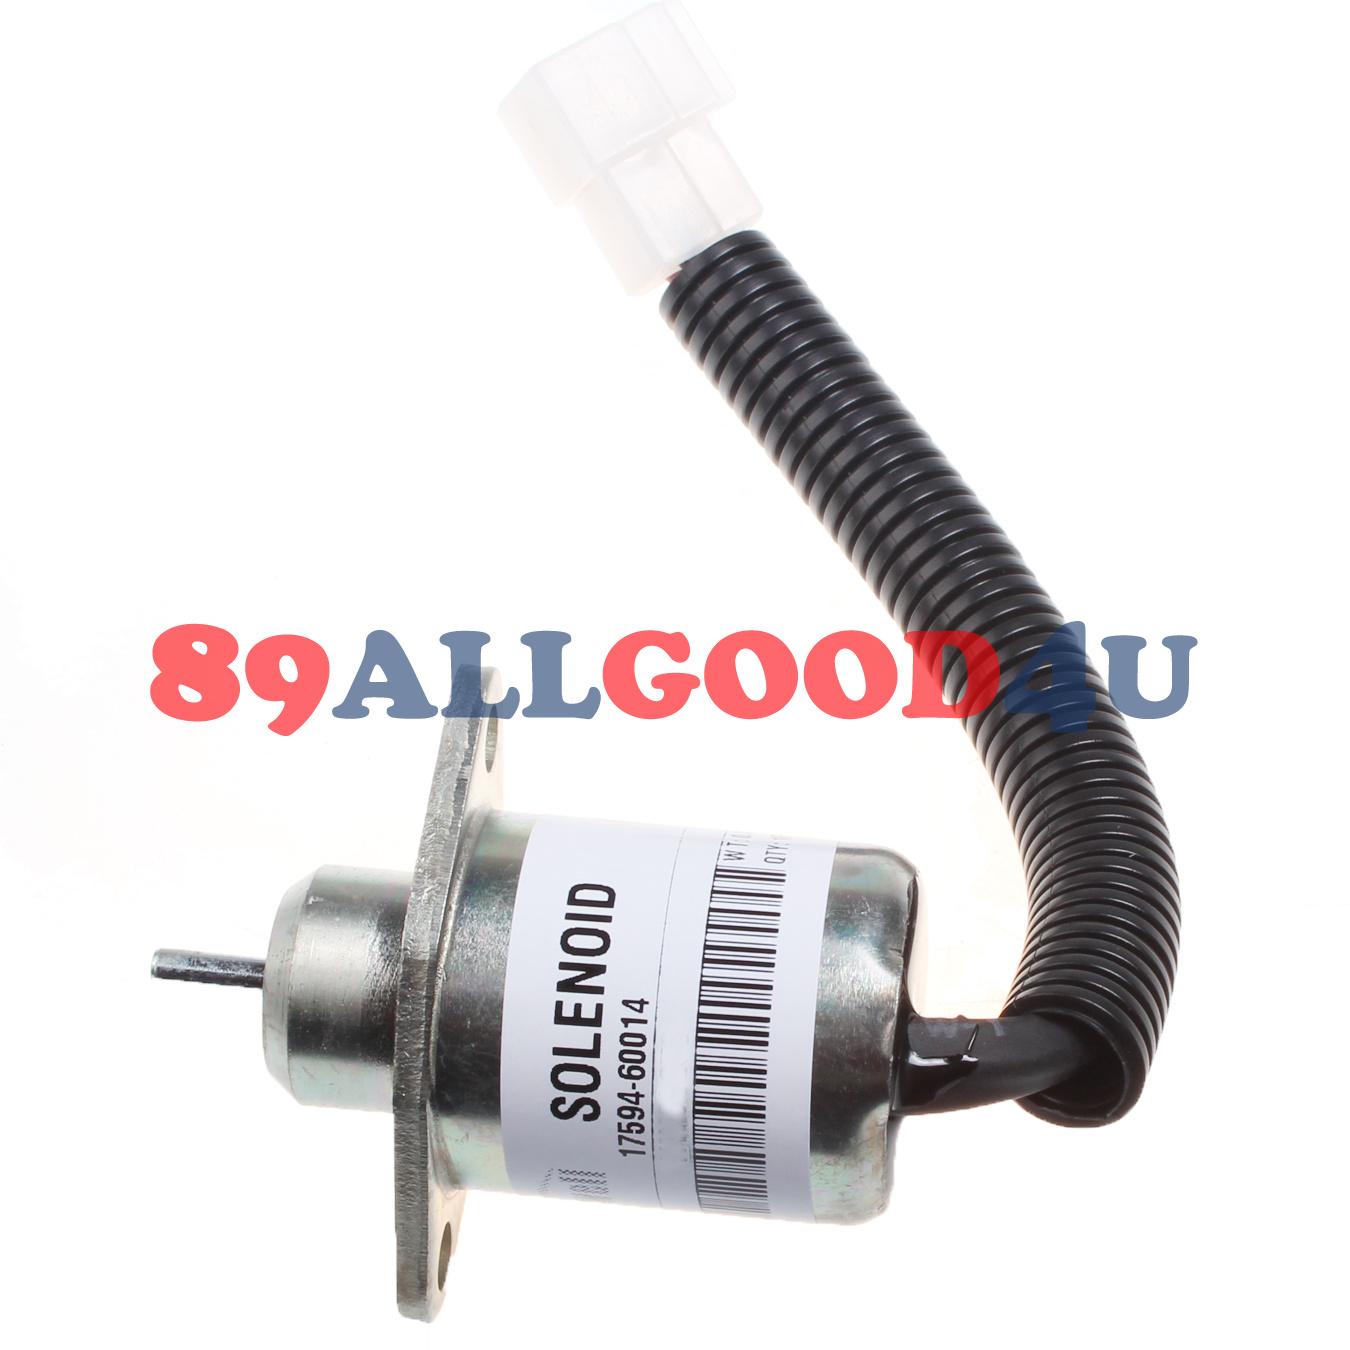 Stop solenoid for Kubota D905 D1005 D1105 Tractor Mower Generator Tower Digger